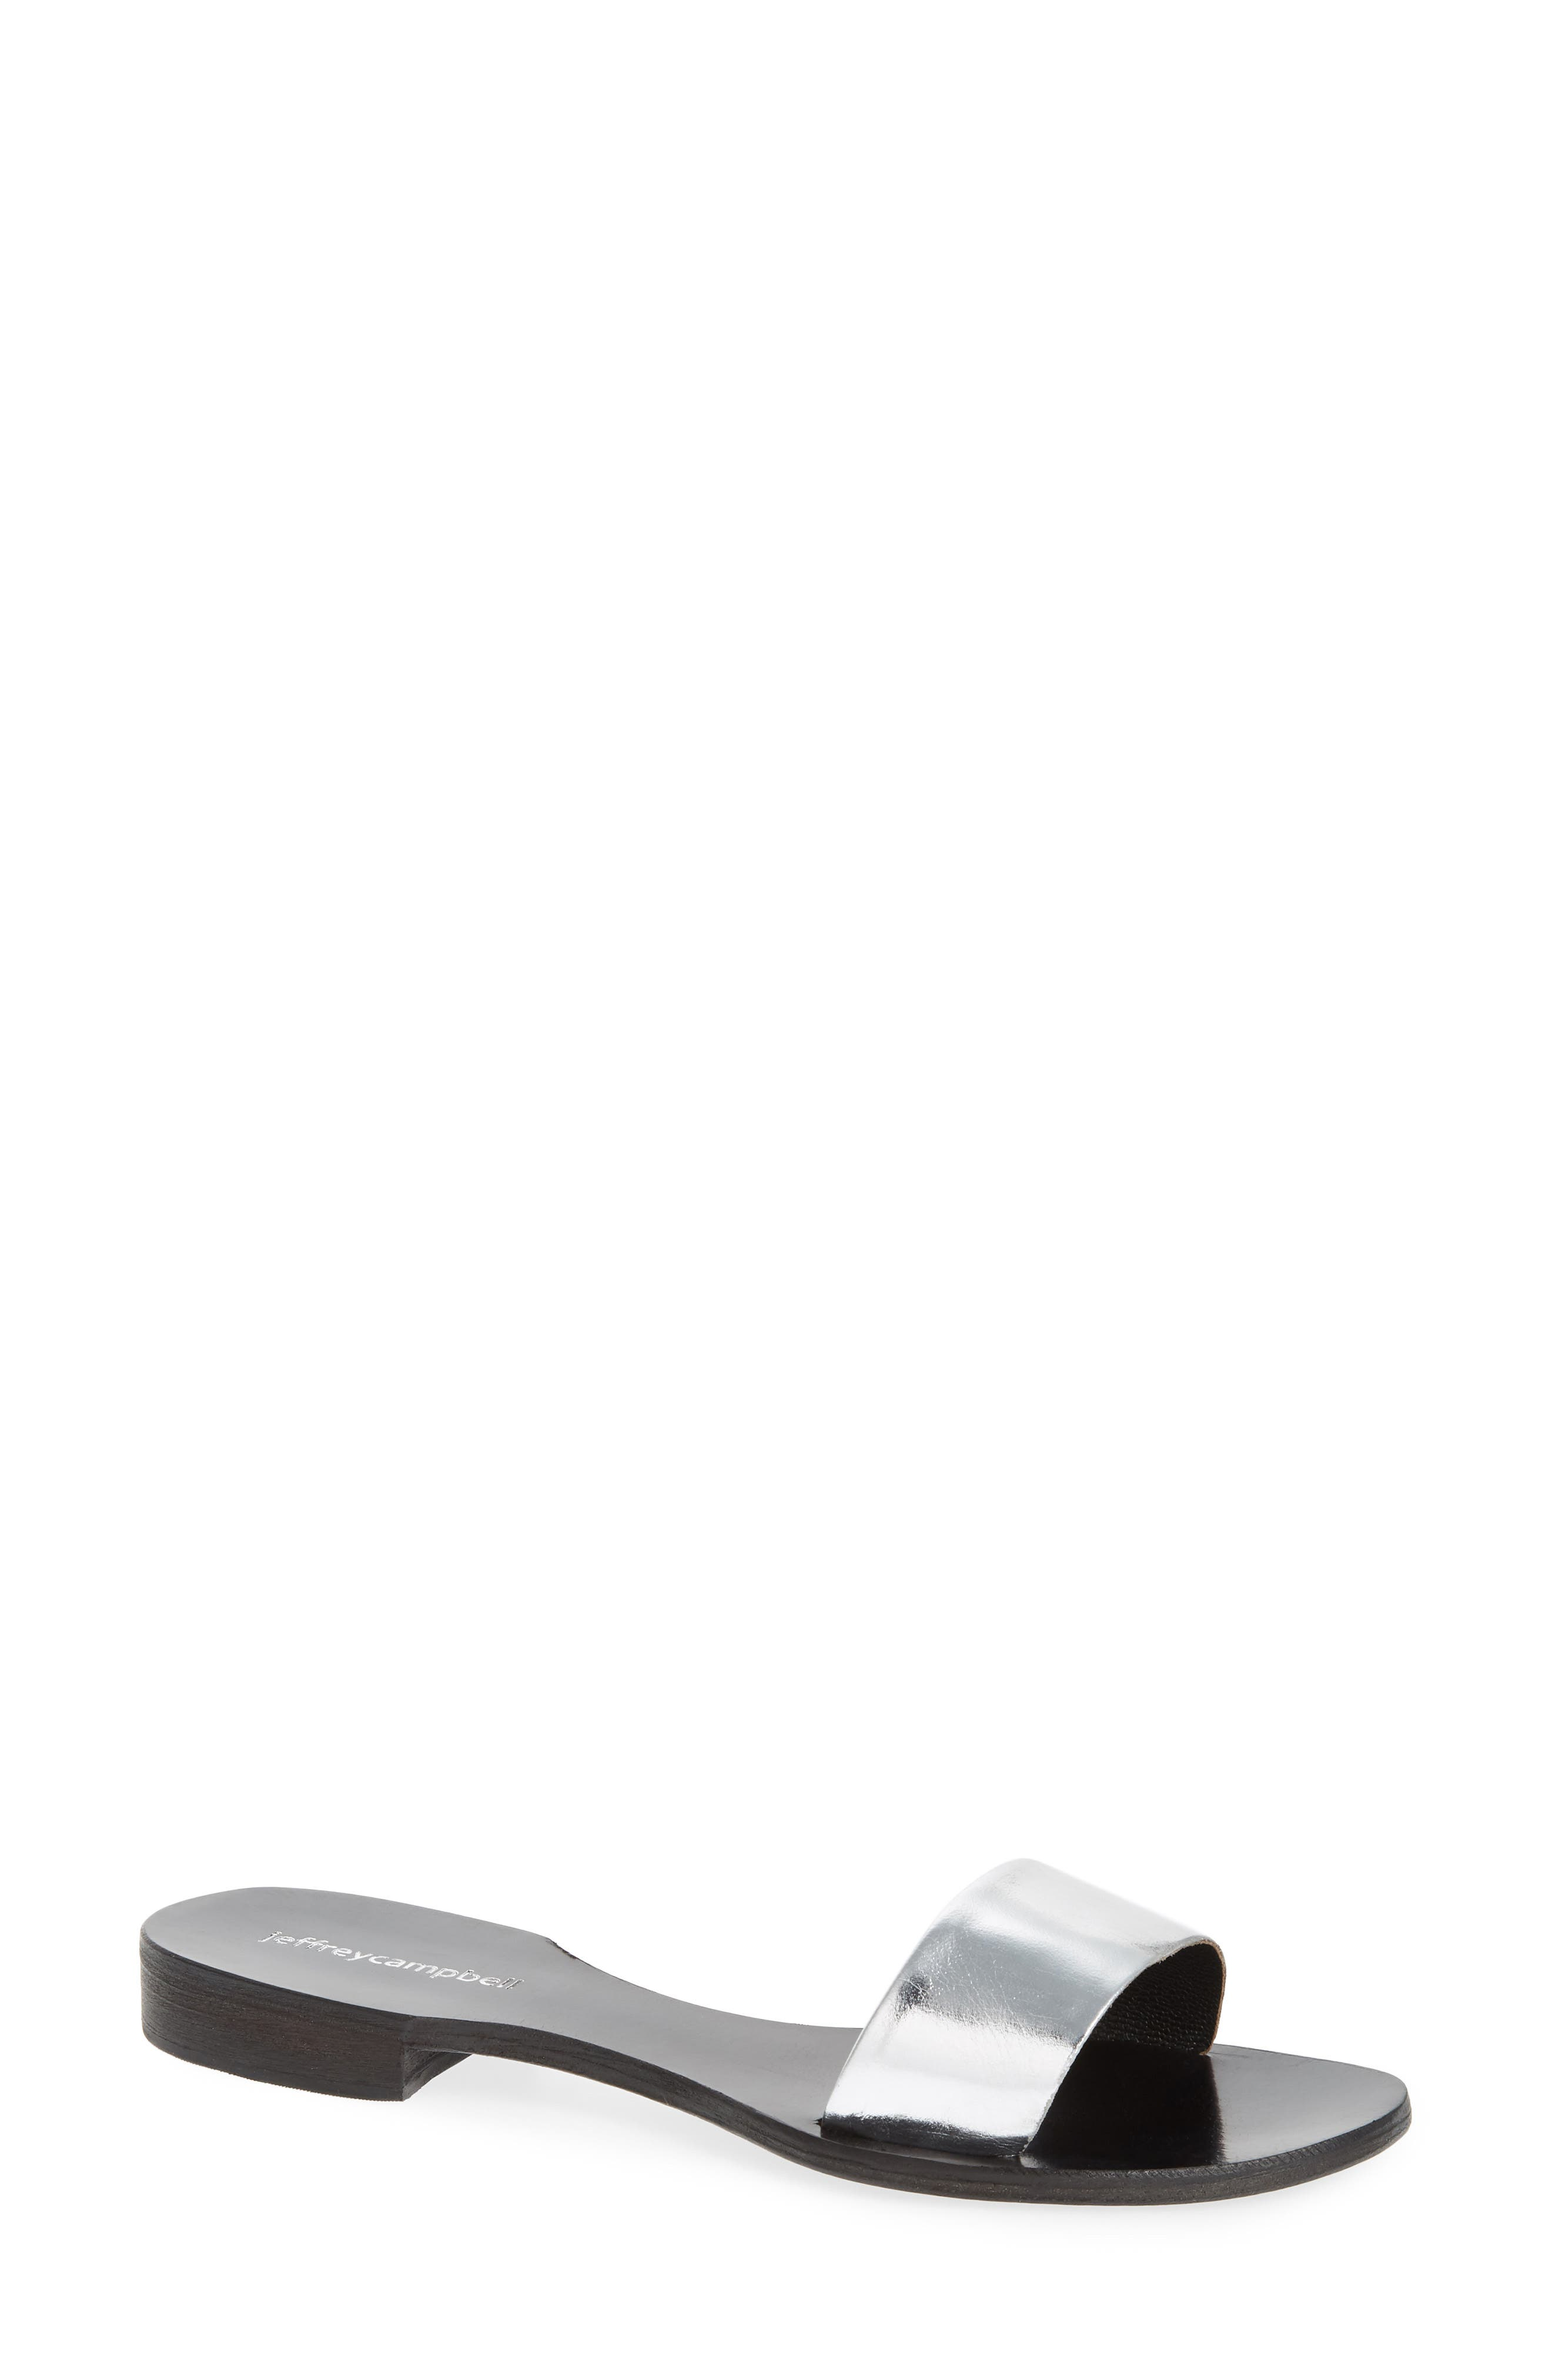 Monzon Slide Sandal,                             Main thumbnail 1, color,                             Silver Mirror